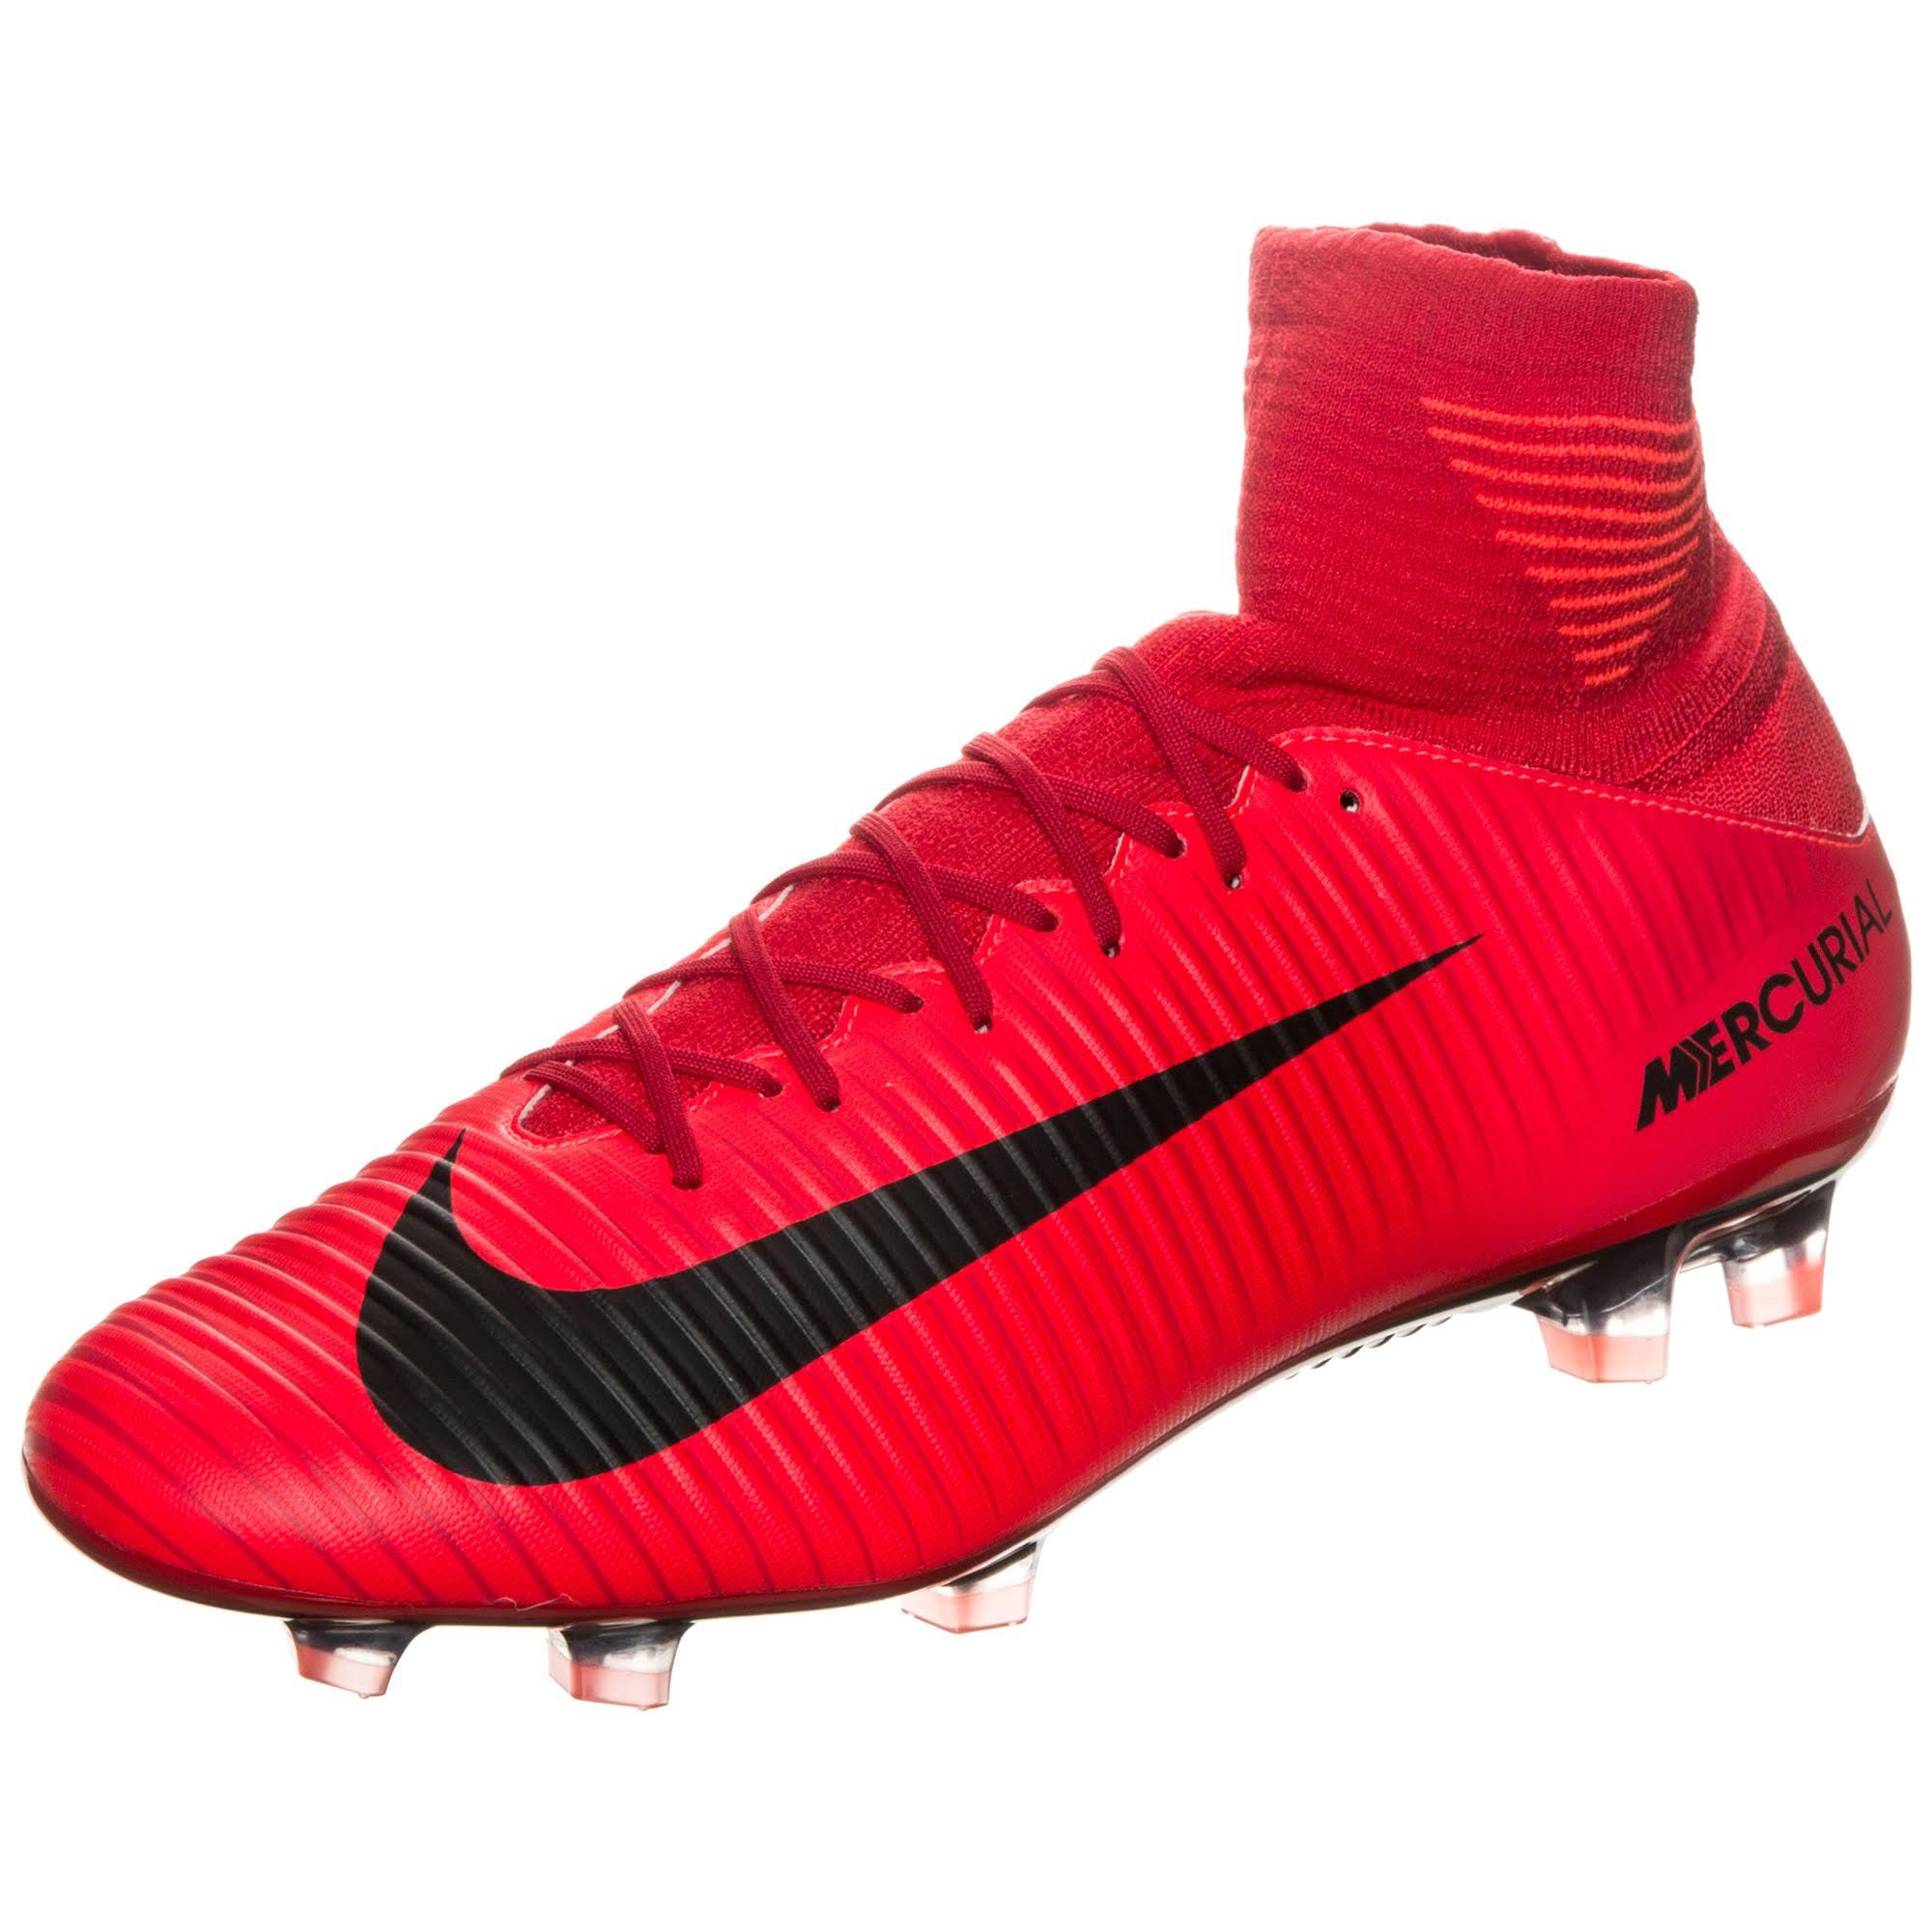 Fußballschuh Fg Mercurial Nike Df Iii schwarz Rot Veloce Herren 1ZUZvqwFn